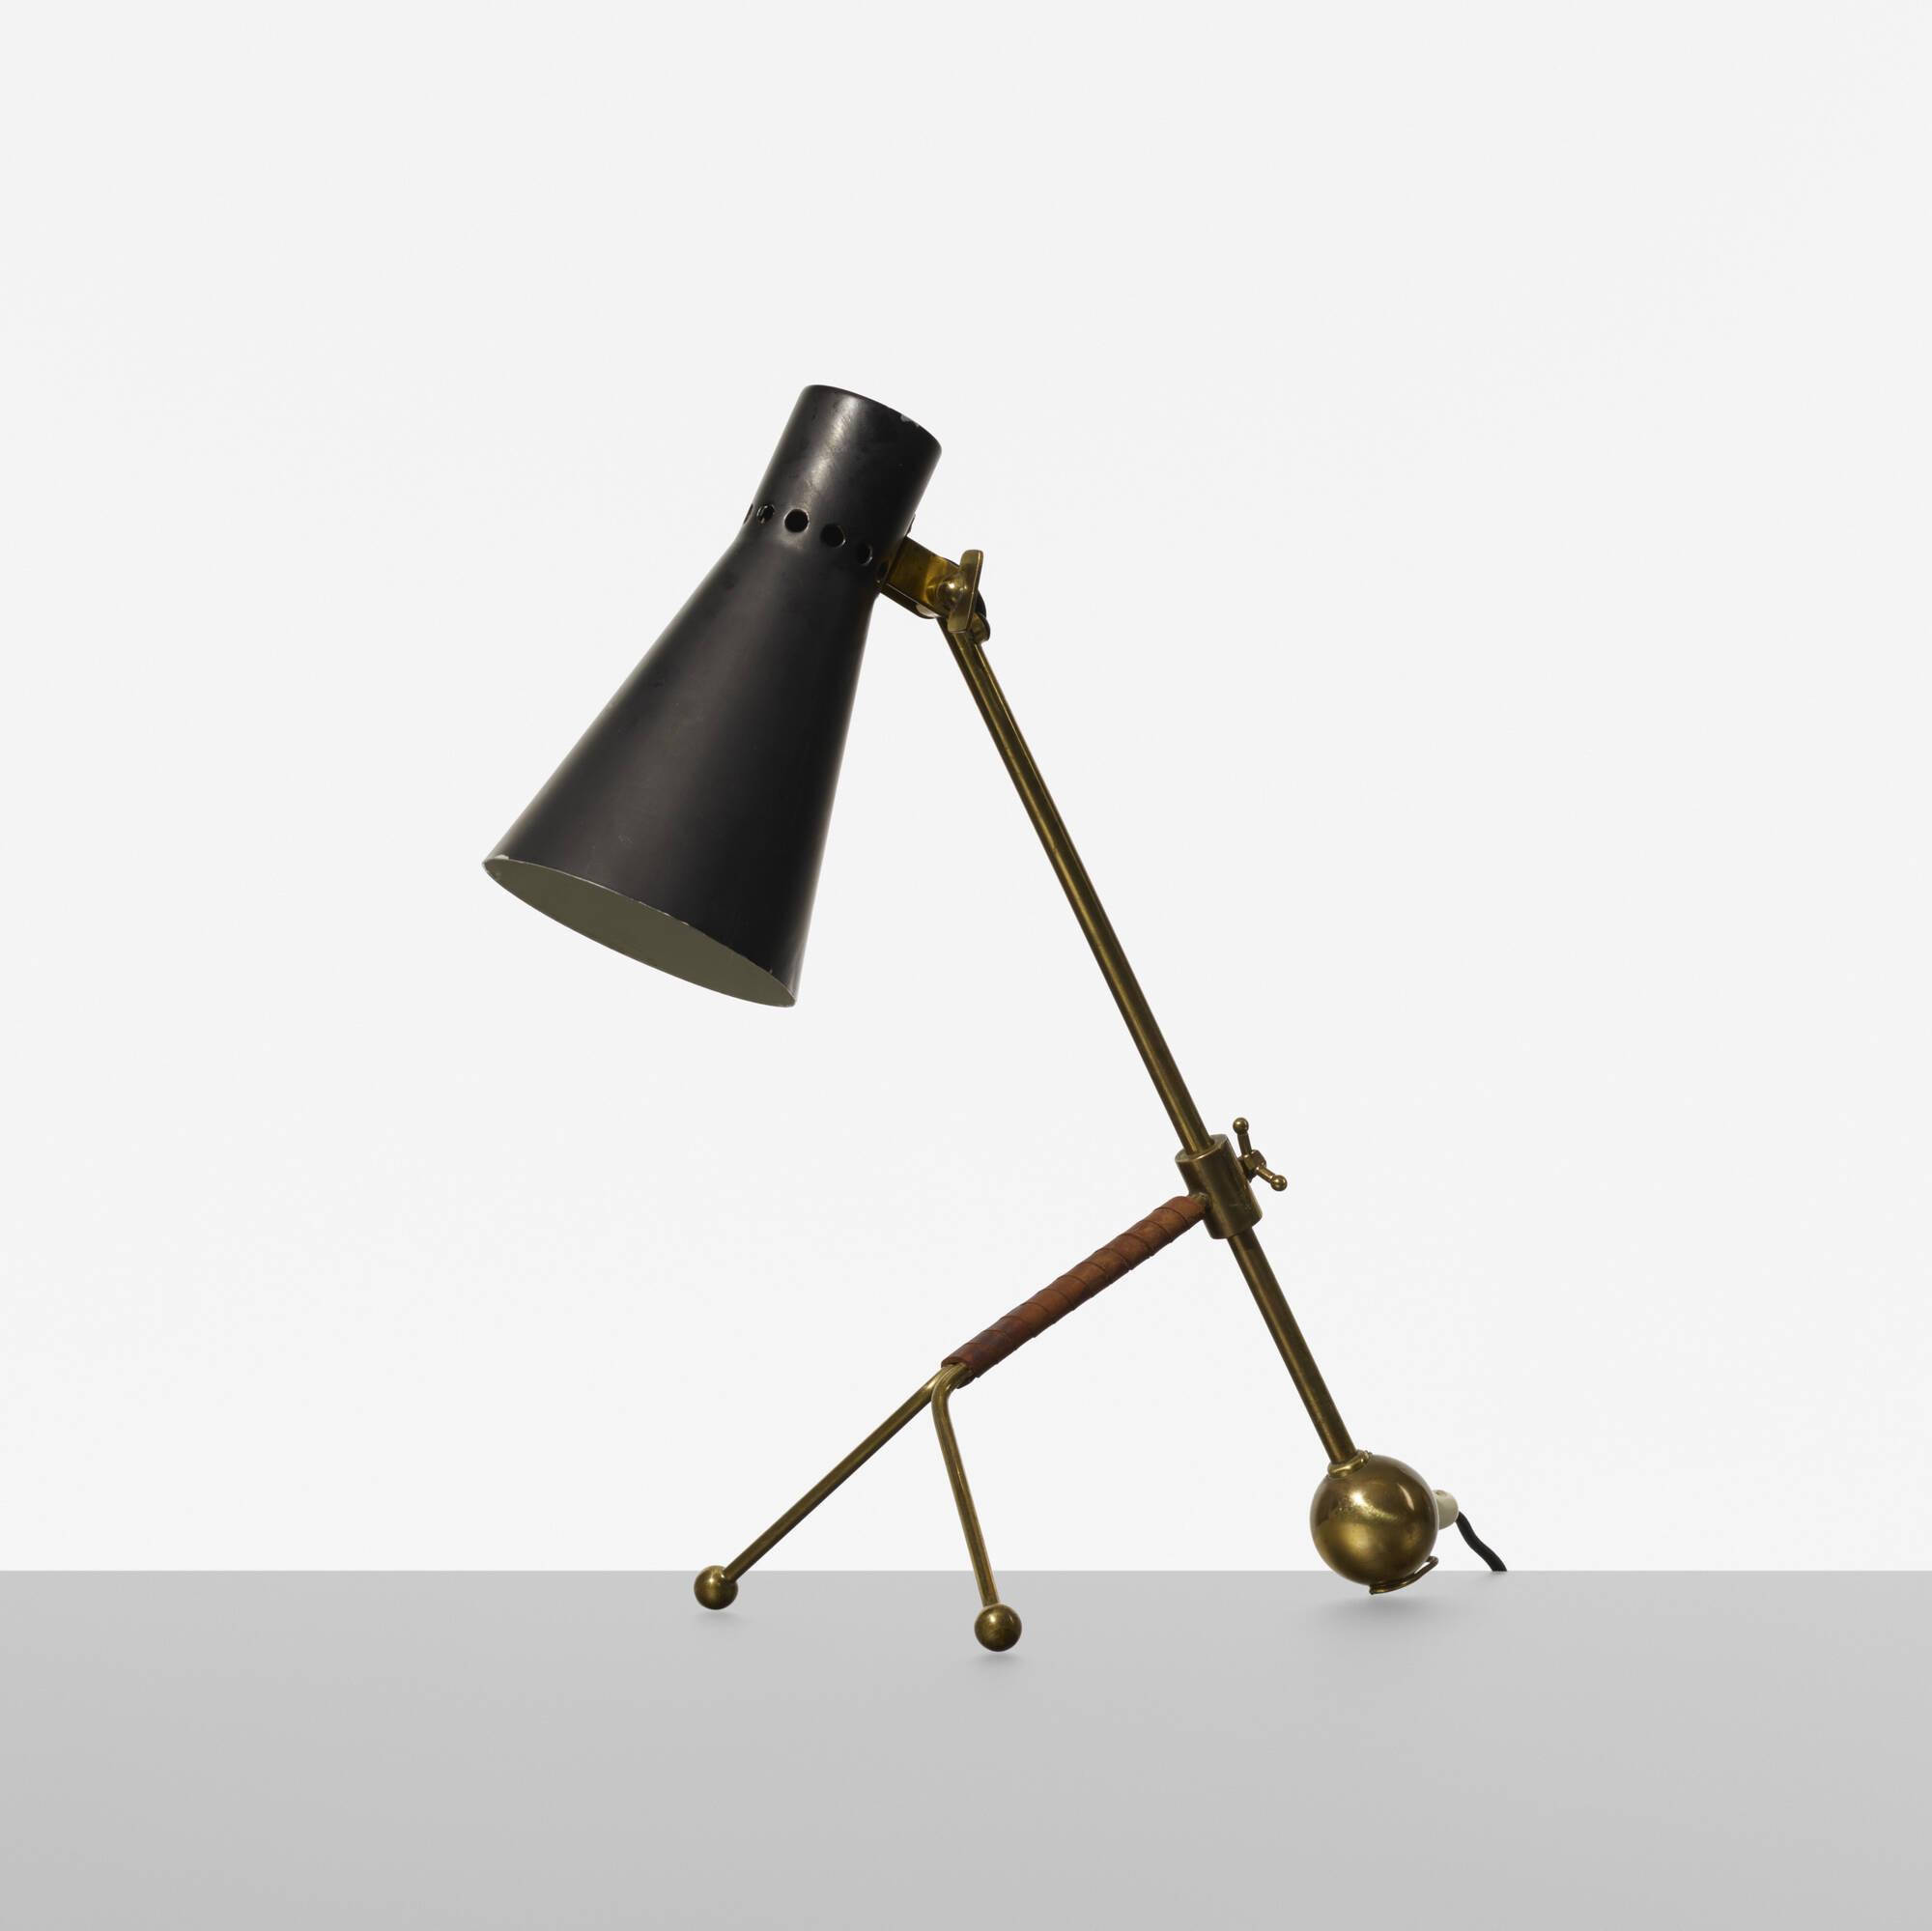 150: Tapio Wirkkala / table lamp, model K11-16 (1 of 1)